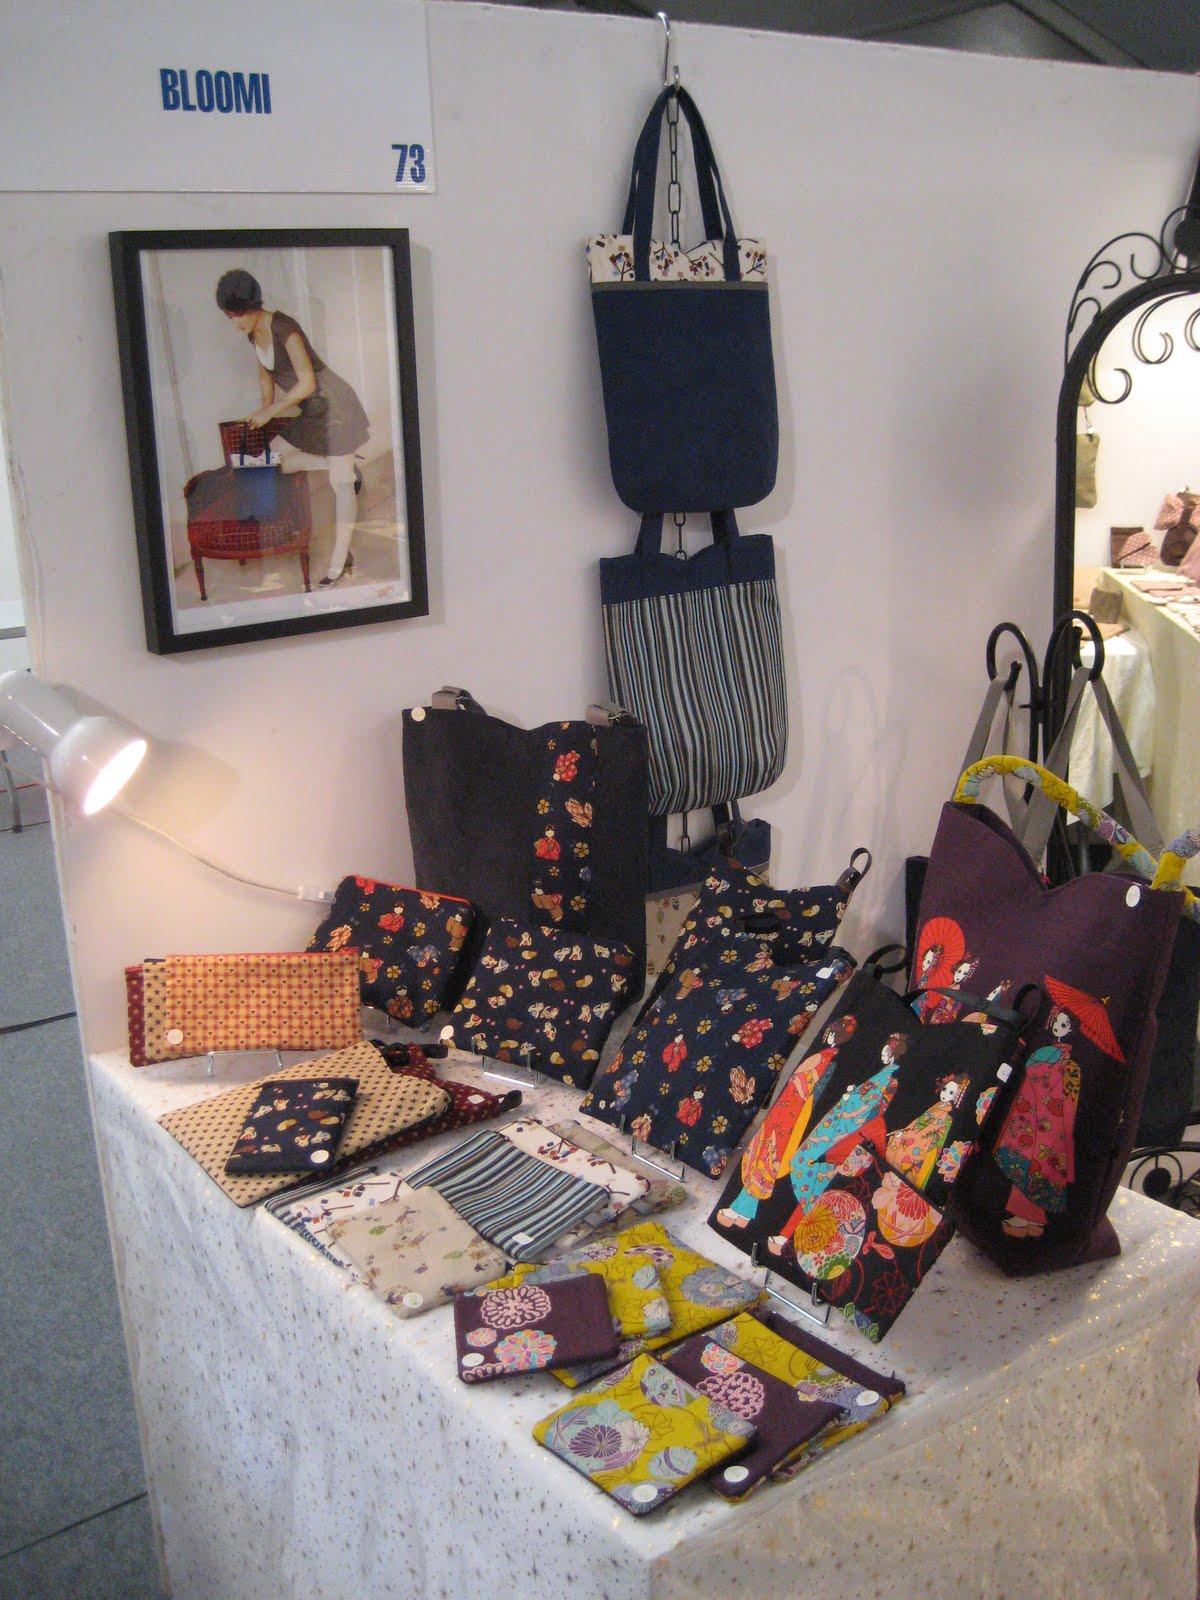 Bloomi salon d 39 artisanat d 39 art de saint maur for Salon artisanat d art